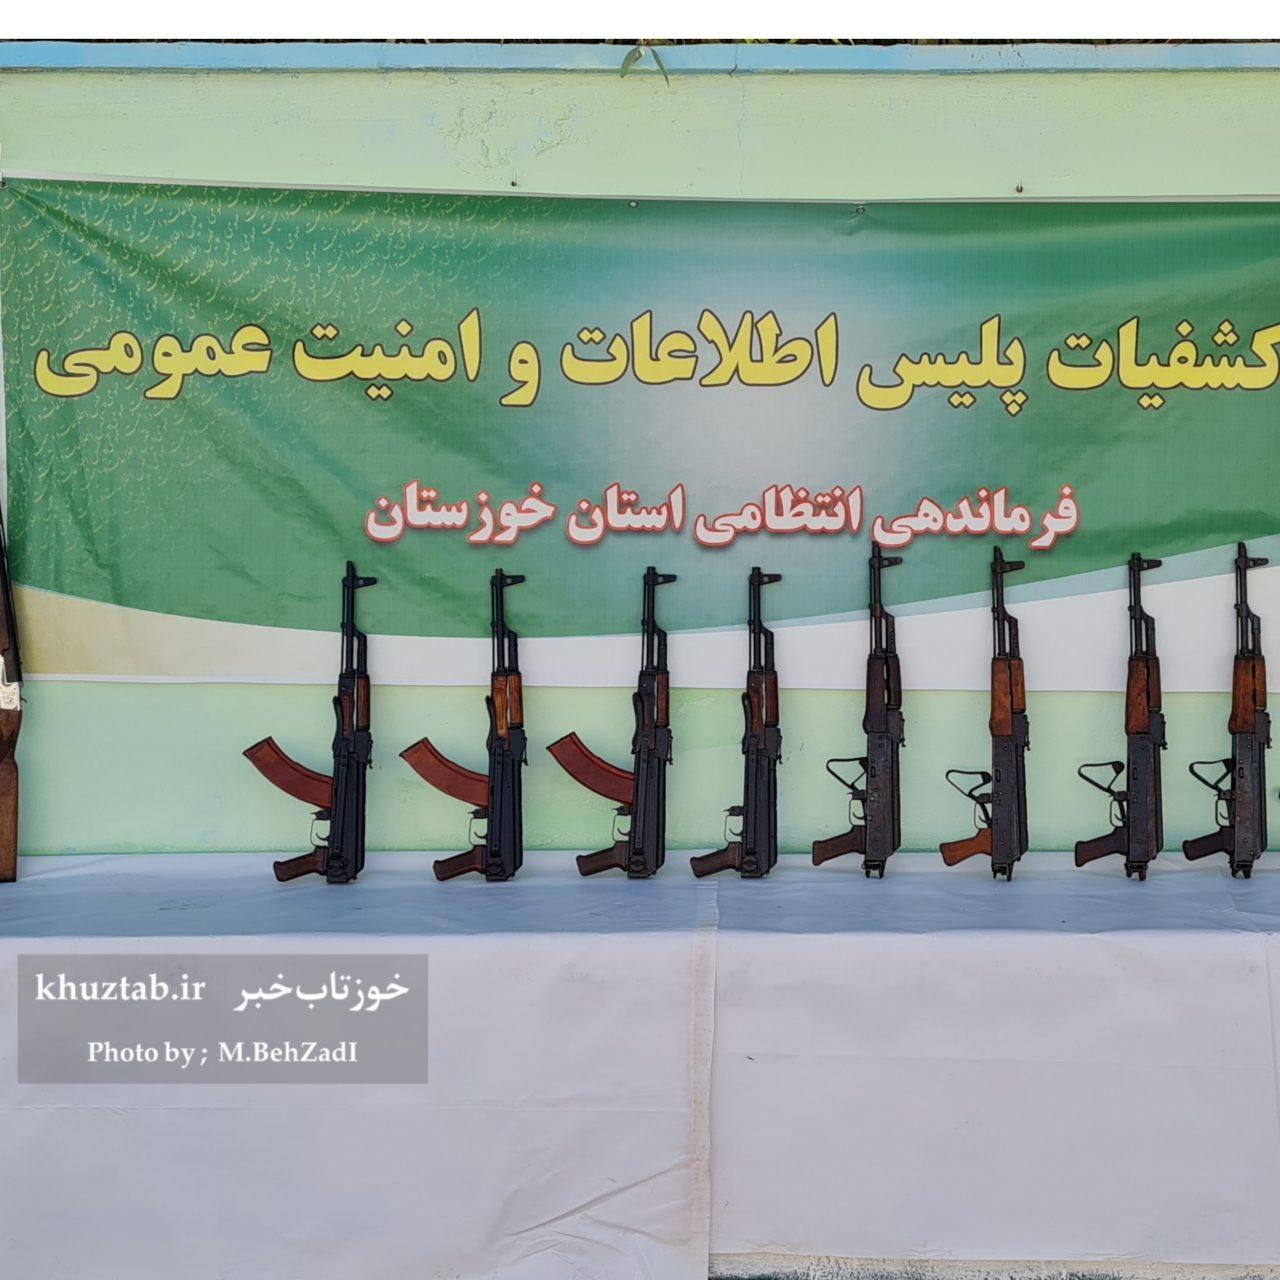 PicsArt 06 27 12.26.40 1280x1280 کشف بیش از 4 تُن انواع مواد مخدر در خوزستان/ افزایش 29 درصدی کشفیات قاچاق/ انهدام 21 باند سرقت مسلحانه/کشف ۱۵۱۲ دستگاه ماینر